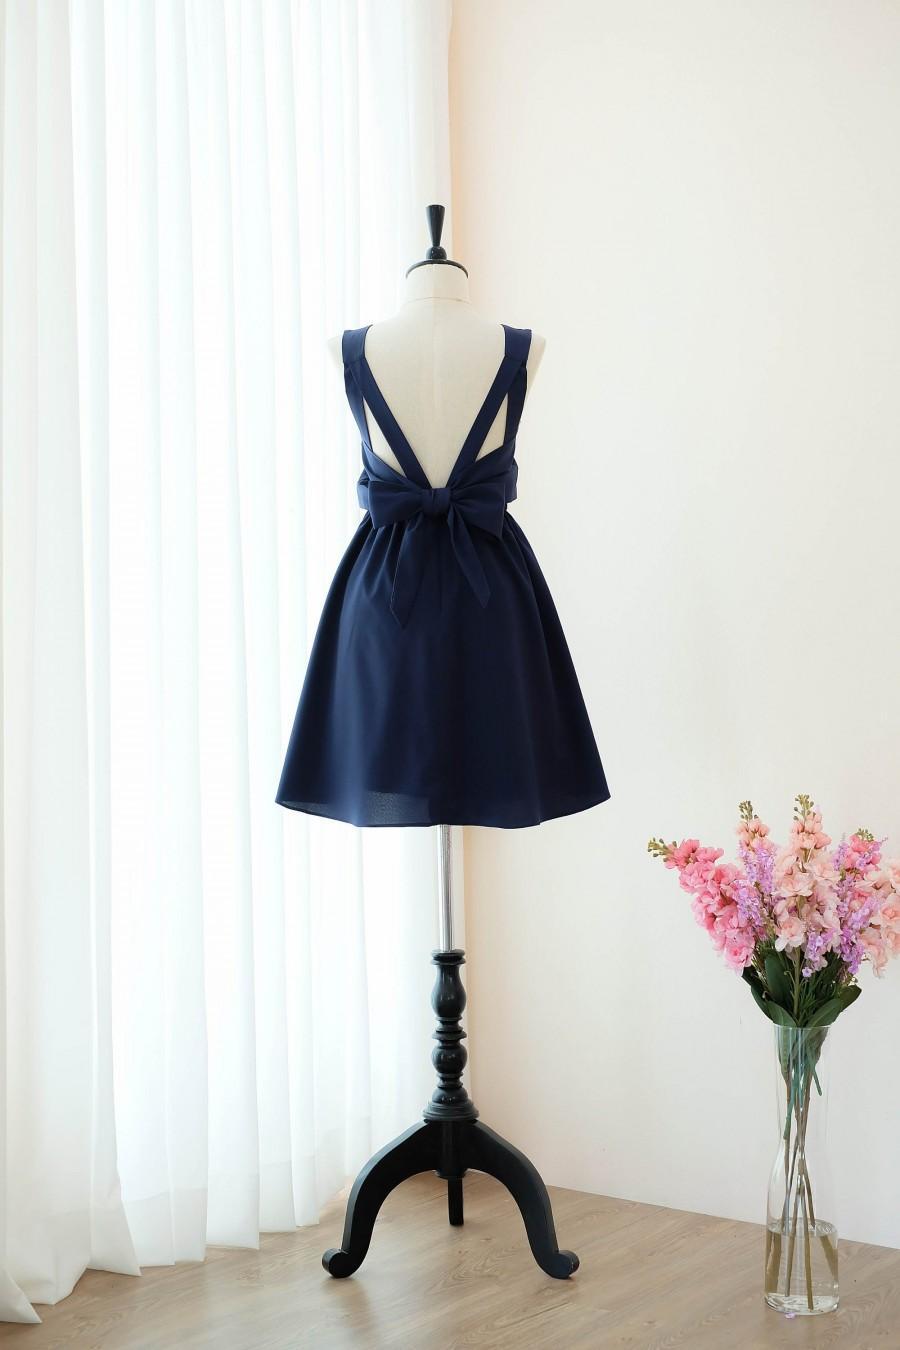 Mariage - Navy dress Navy Bridesmaid dress Wedding Prom dress Cocktail Party dress Evening dress Backless bow dress